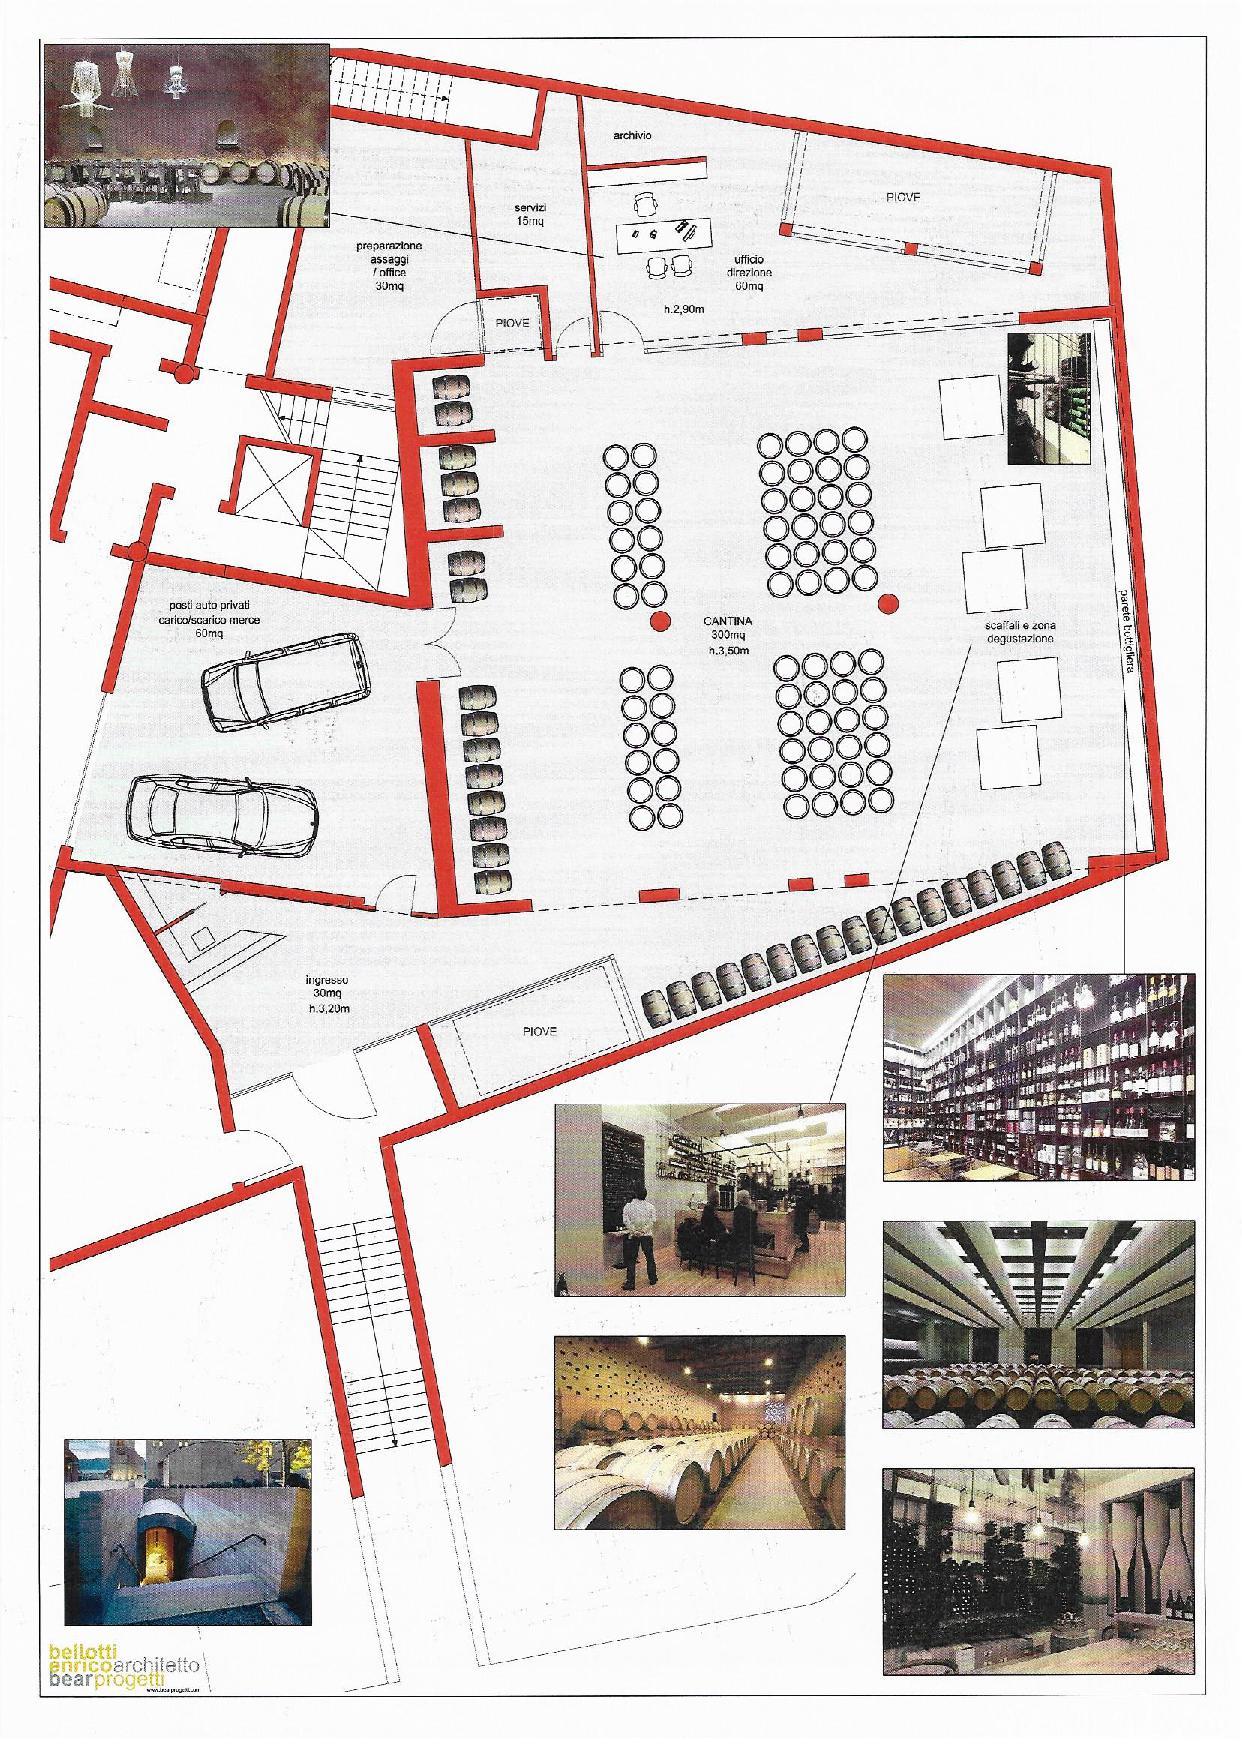 Grande magazzino/deposito a Bormio